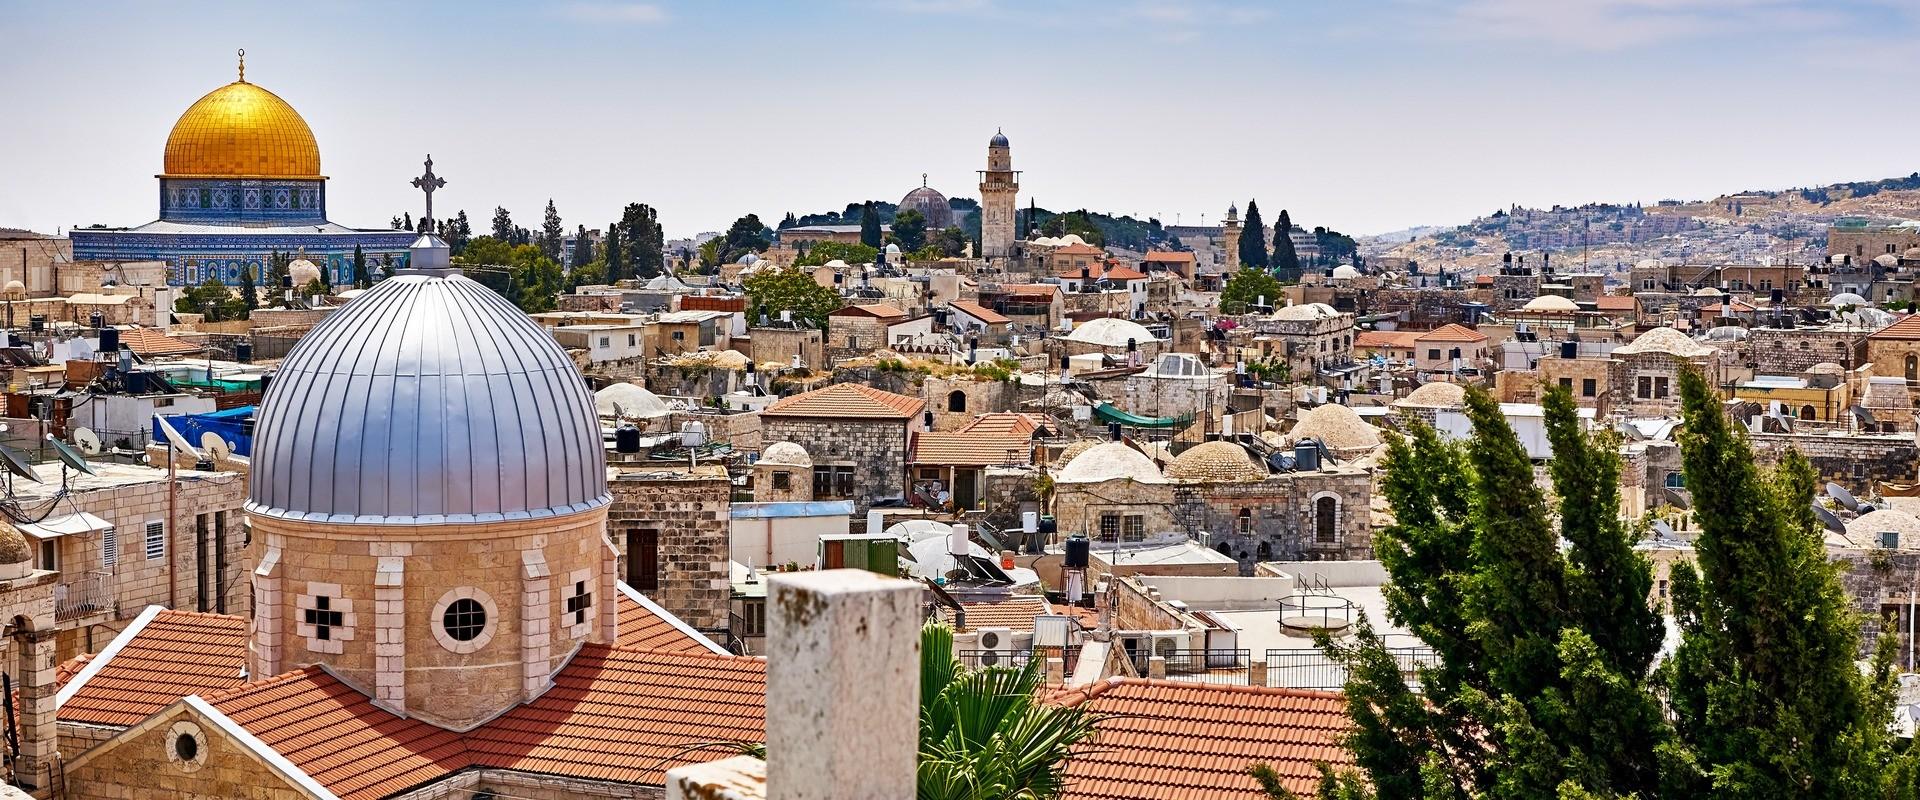 Christian Holy Land Tours | Holy Land VIP Tours